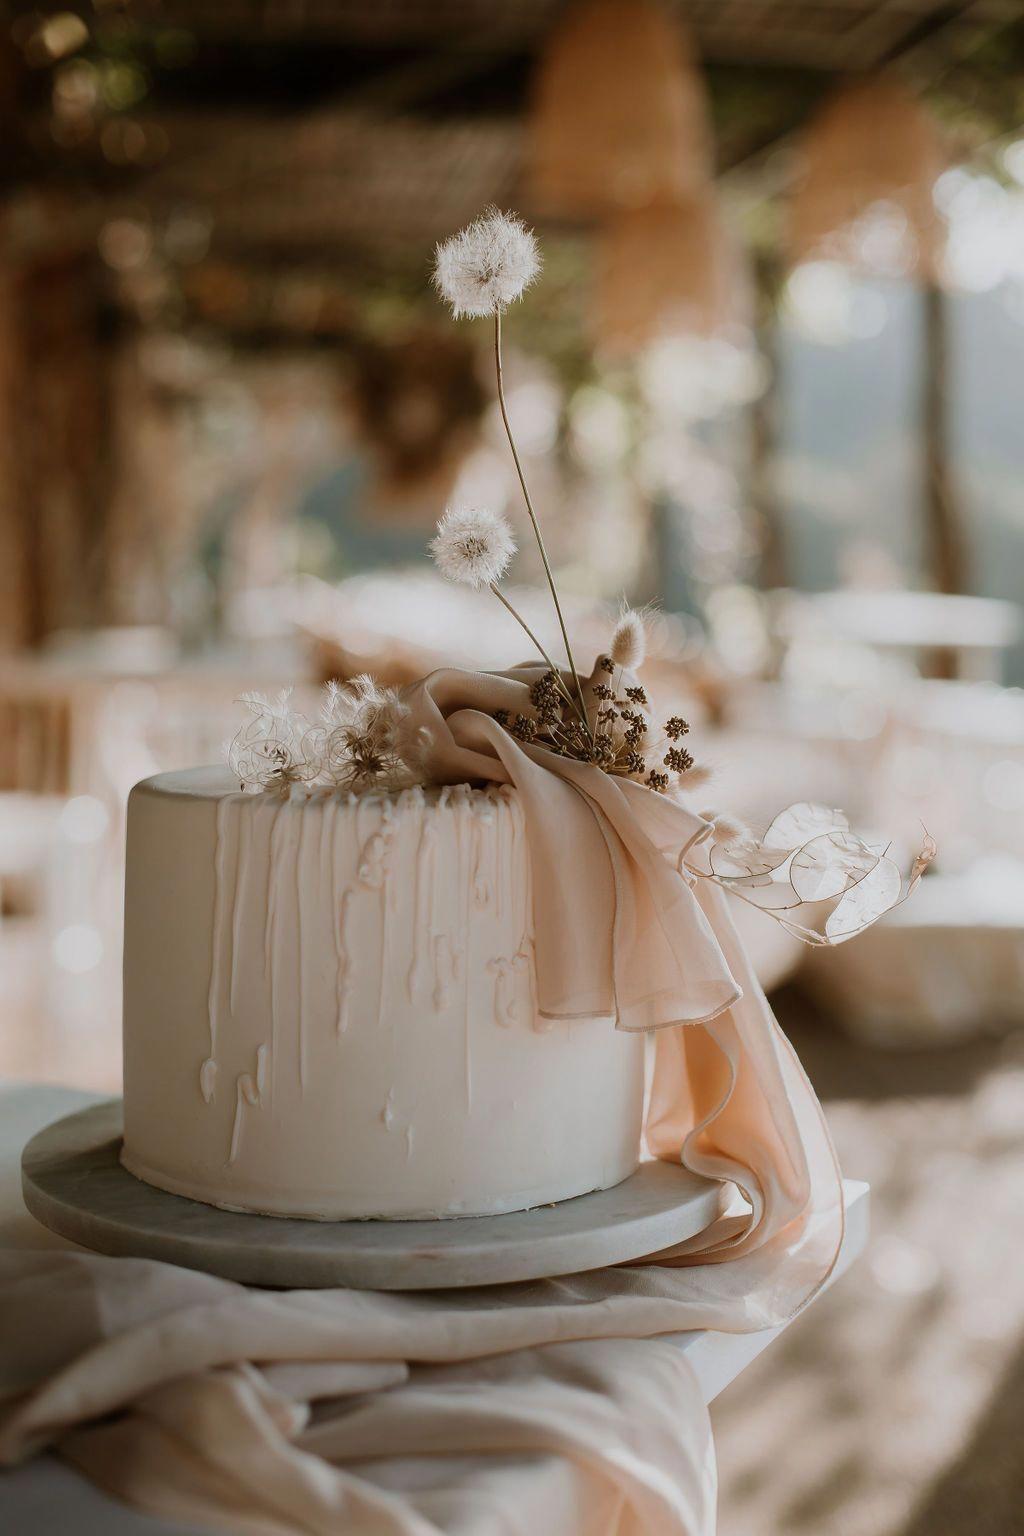 Modern minimal delicate wedding drip cake with dried